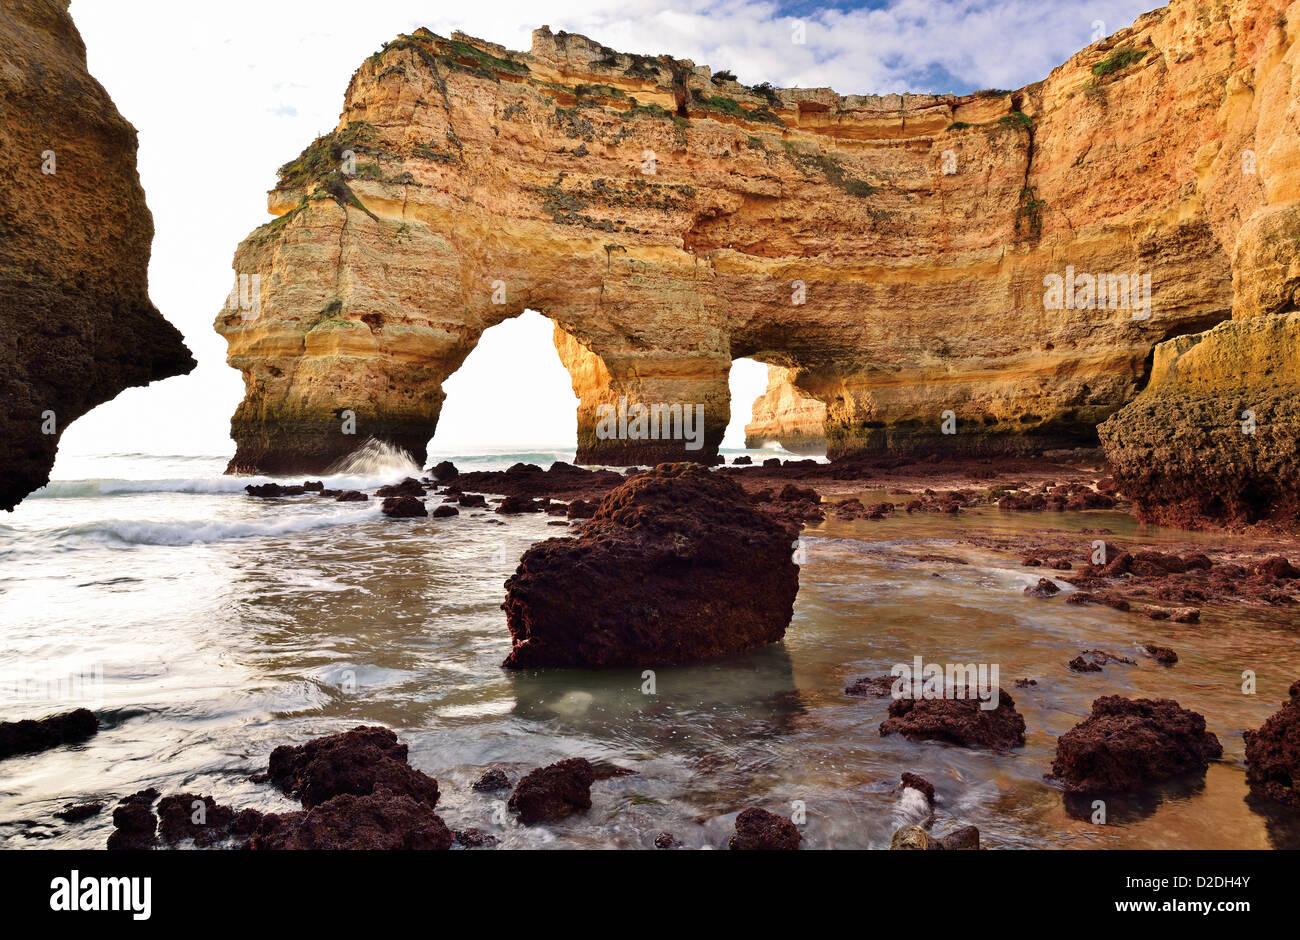 Portugal, Algarve: Limestone arcs with ebb tide at beach Praia da Marinha - Stock Image